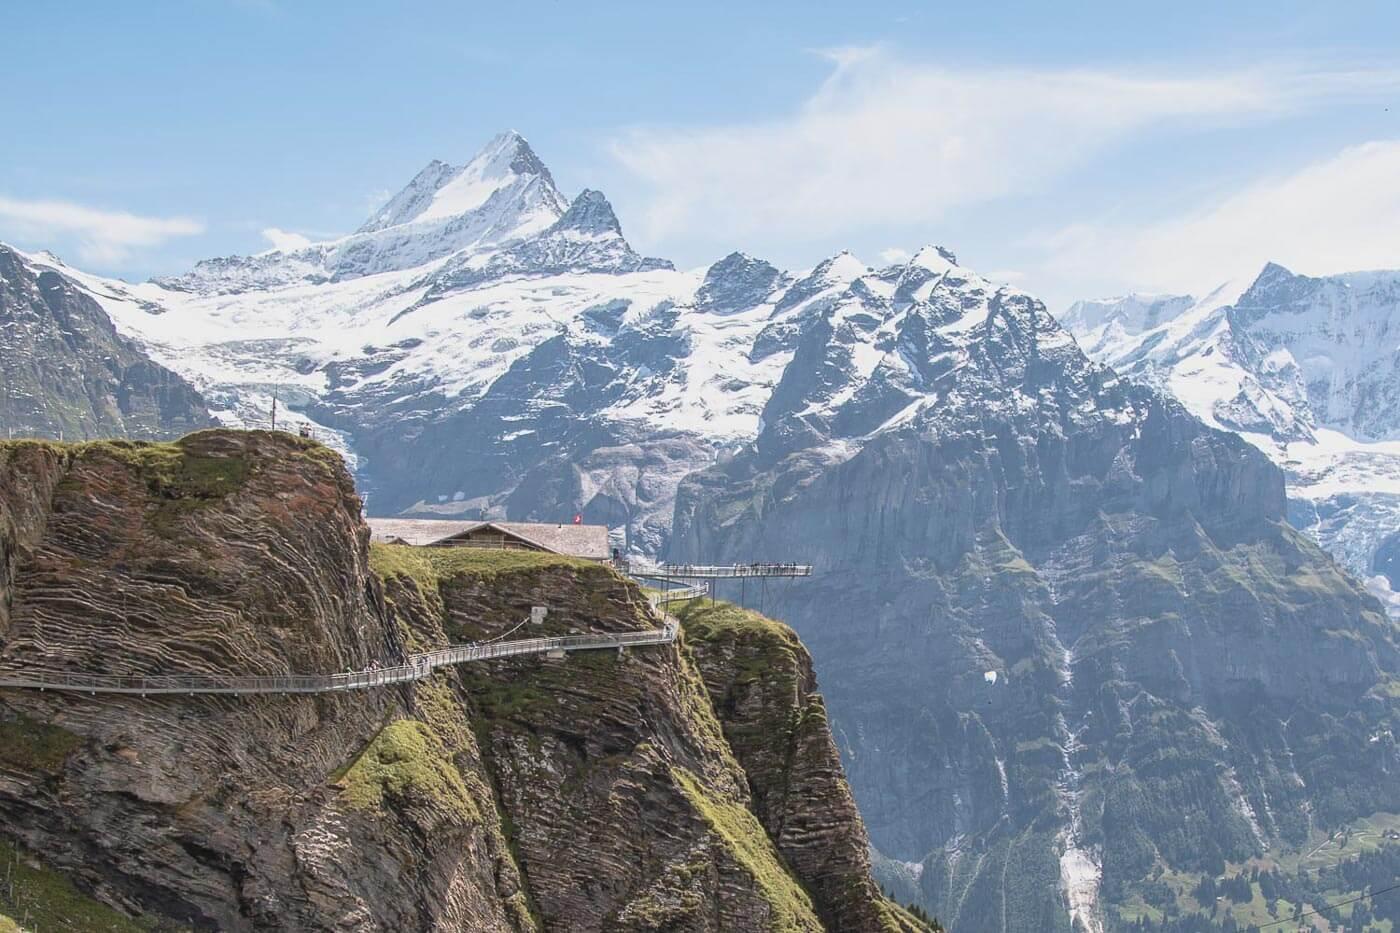 Viagem para Suíça - Turismo para Suíça - Grindelwald